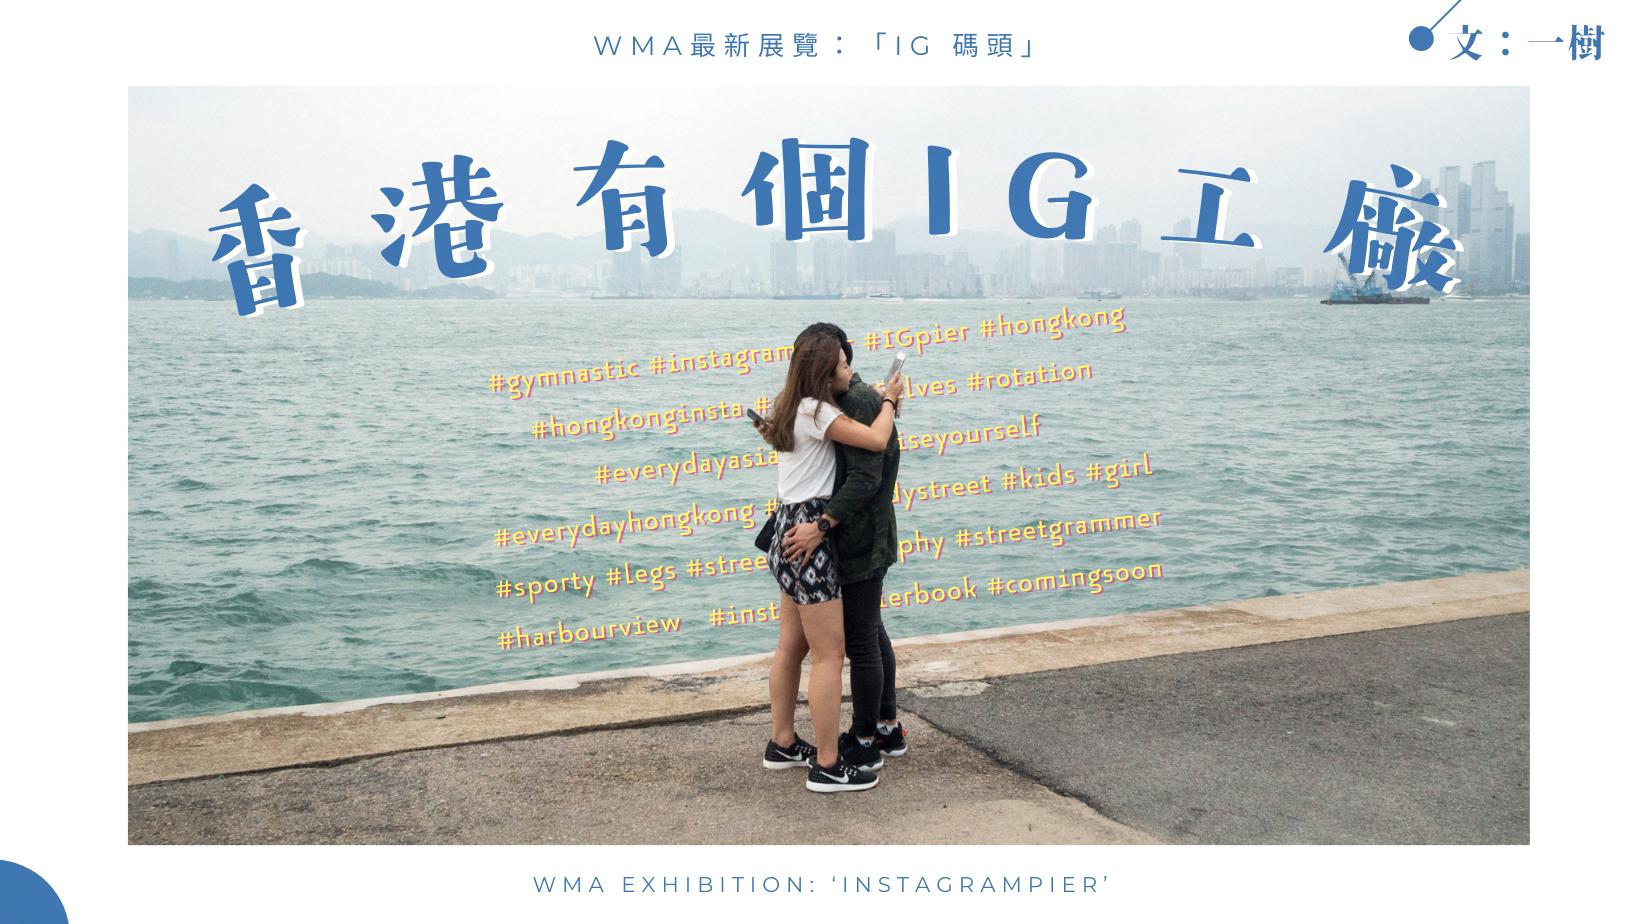 【觀展筆記】《IG碼頭》InstagramPier:香港有個IG工廠